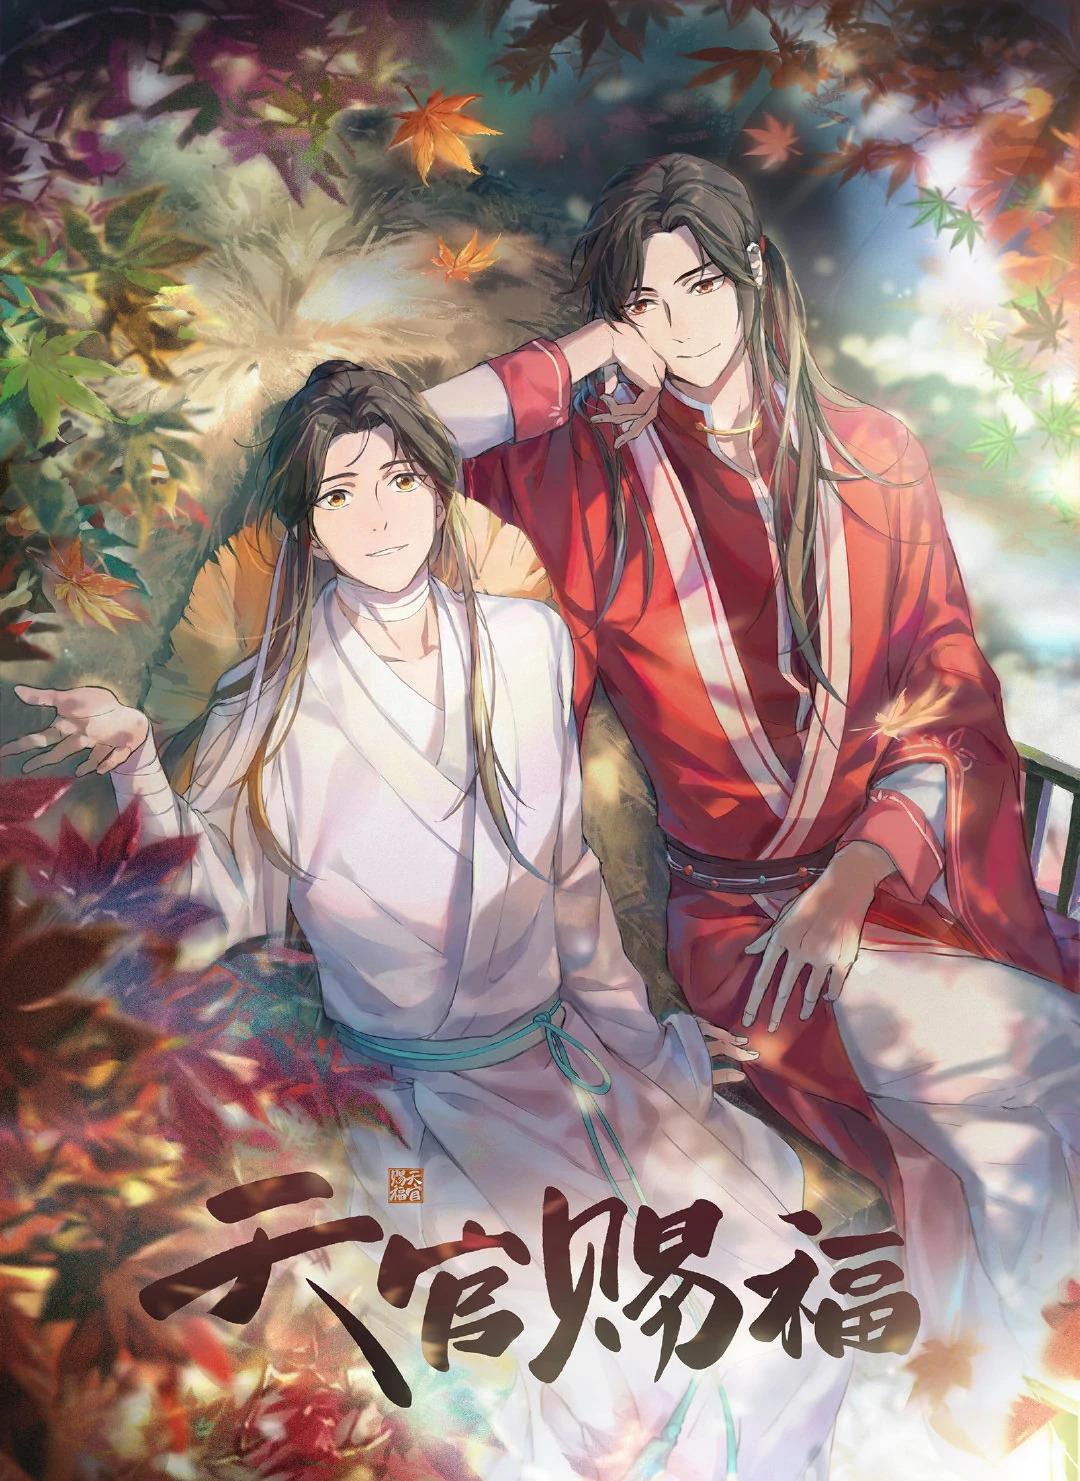 Top 10 Anime Summer 2021 Yang Paling Ditunggu Cewek 6